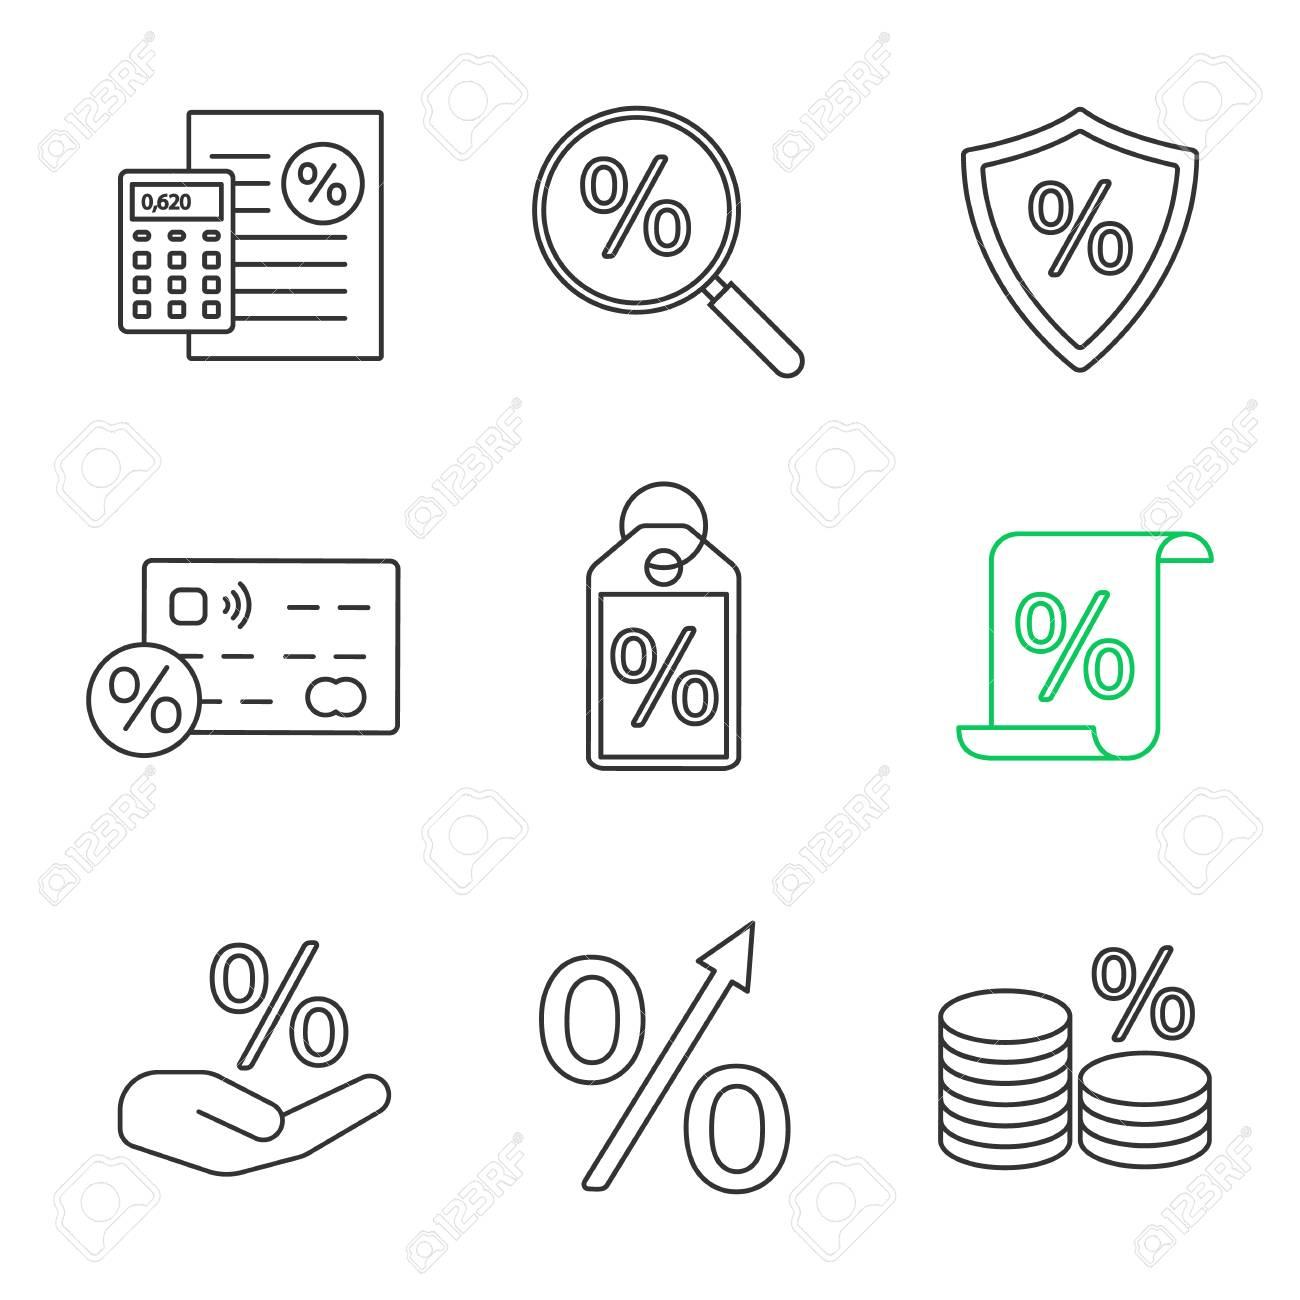 percents linear icons set